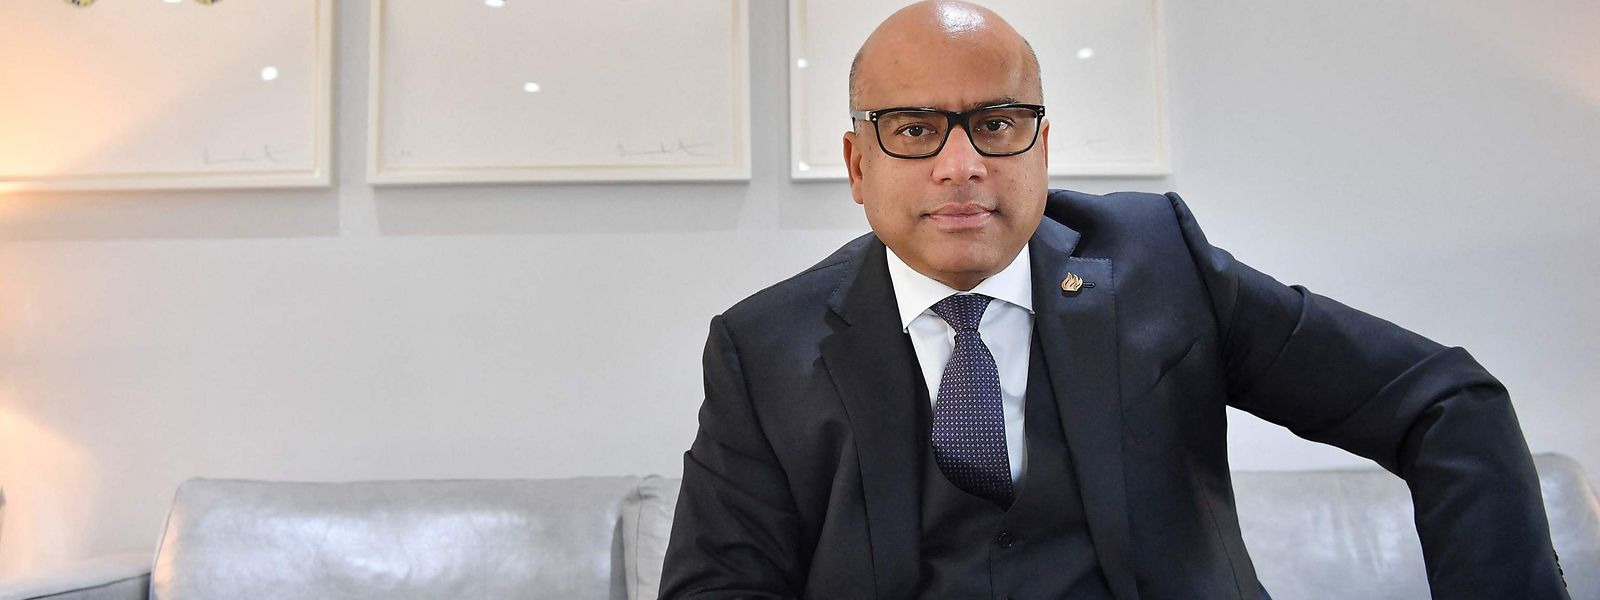 Industriemagnat Sanjeev Gupta.